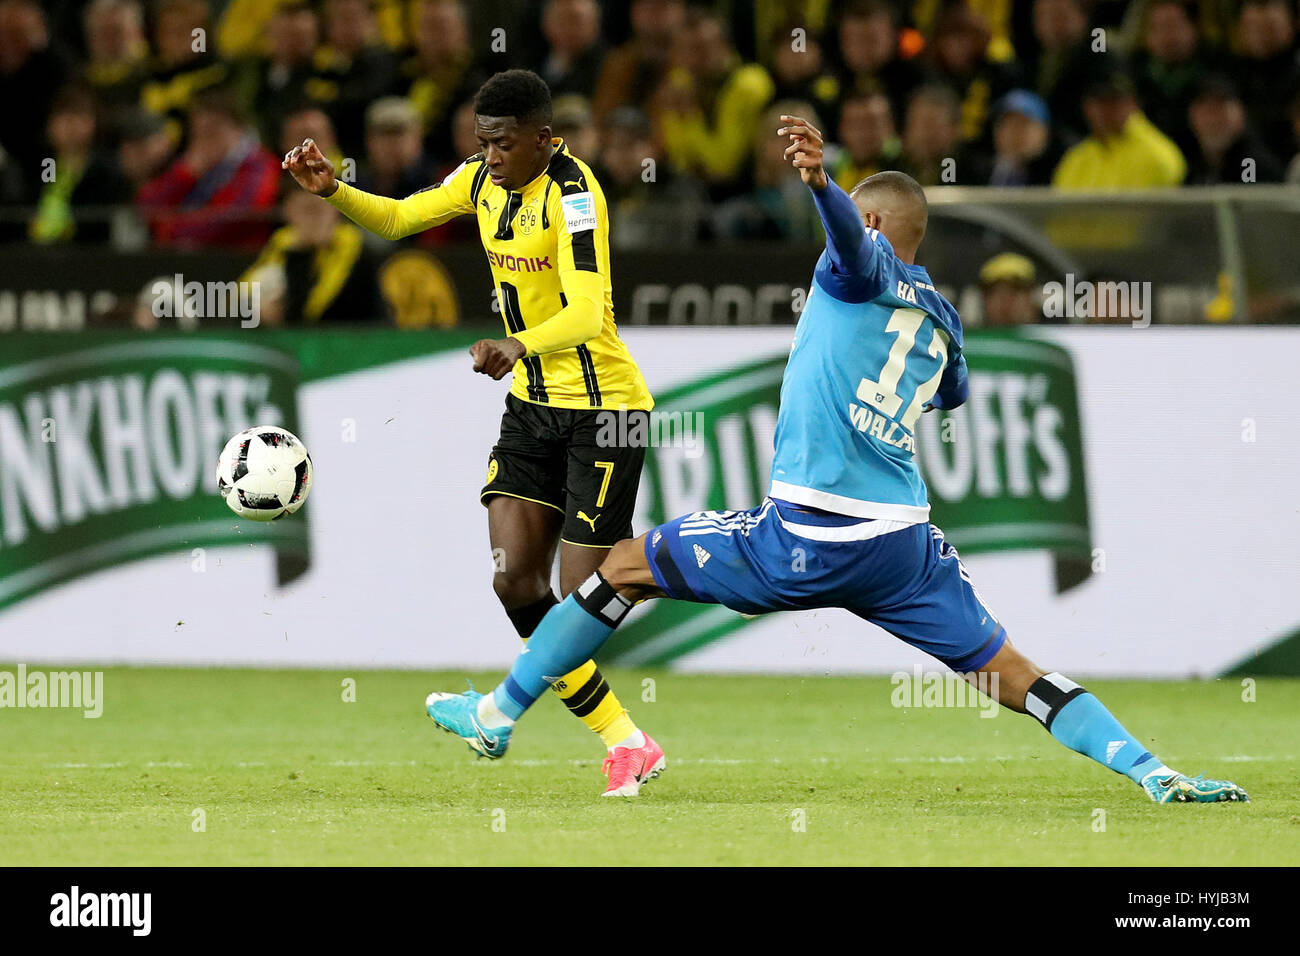 Dortmund. 4th Apr, 2017. Ousmane Dembele (L) of Dortmund vies with Walace of Hamburger SV during the Bundesliga - Stock Image